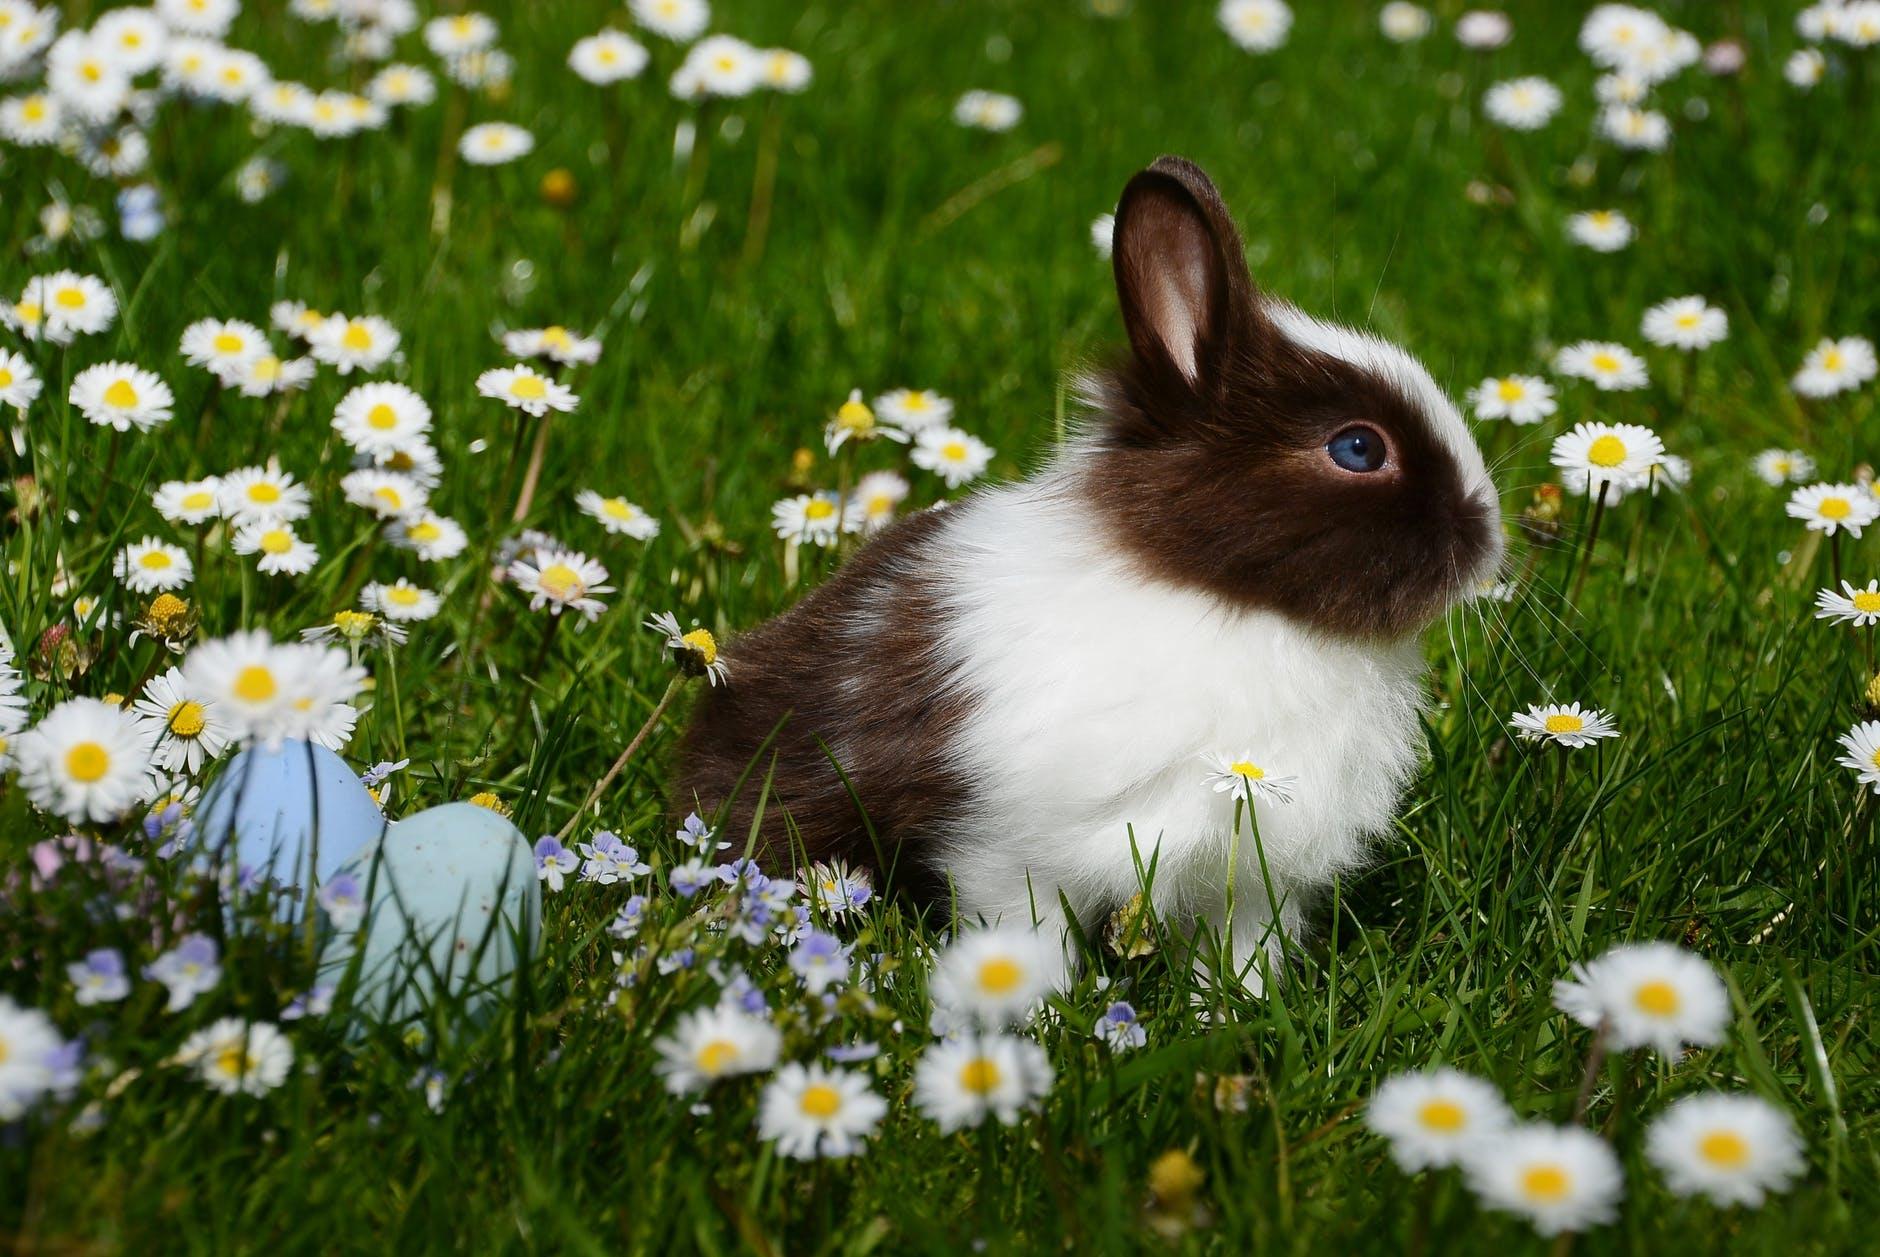 Kelinci Paskah sebagai lambang kesuburan.